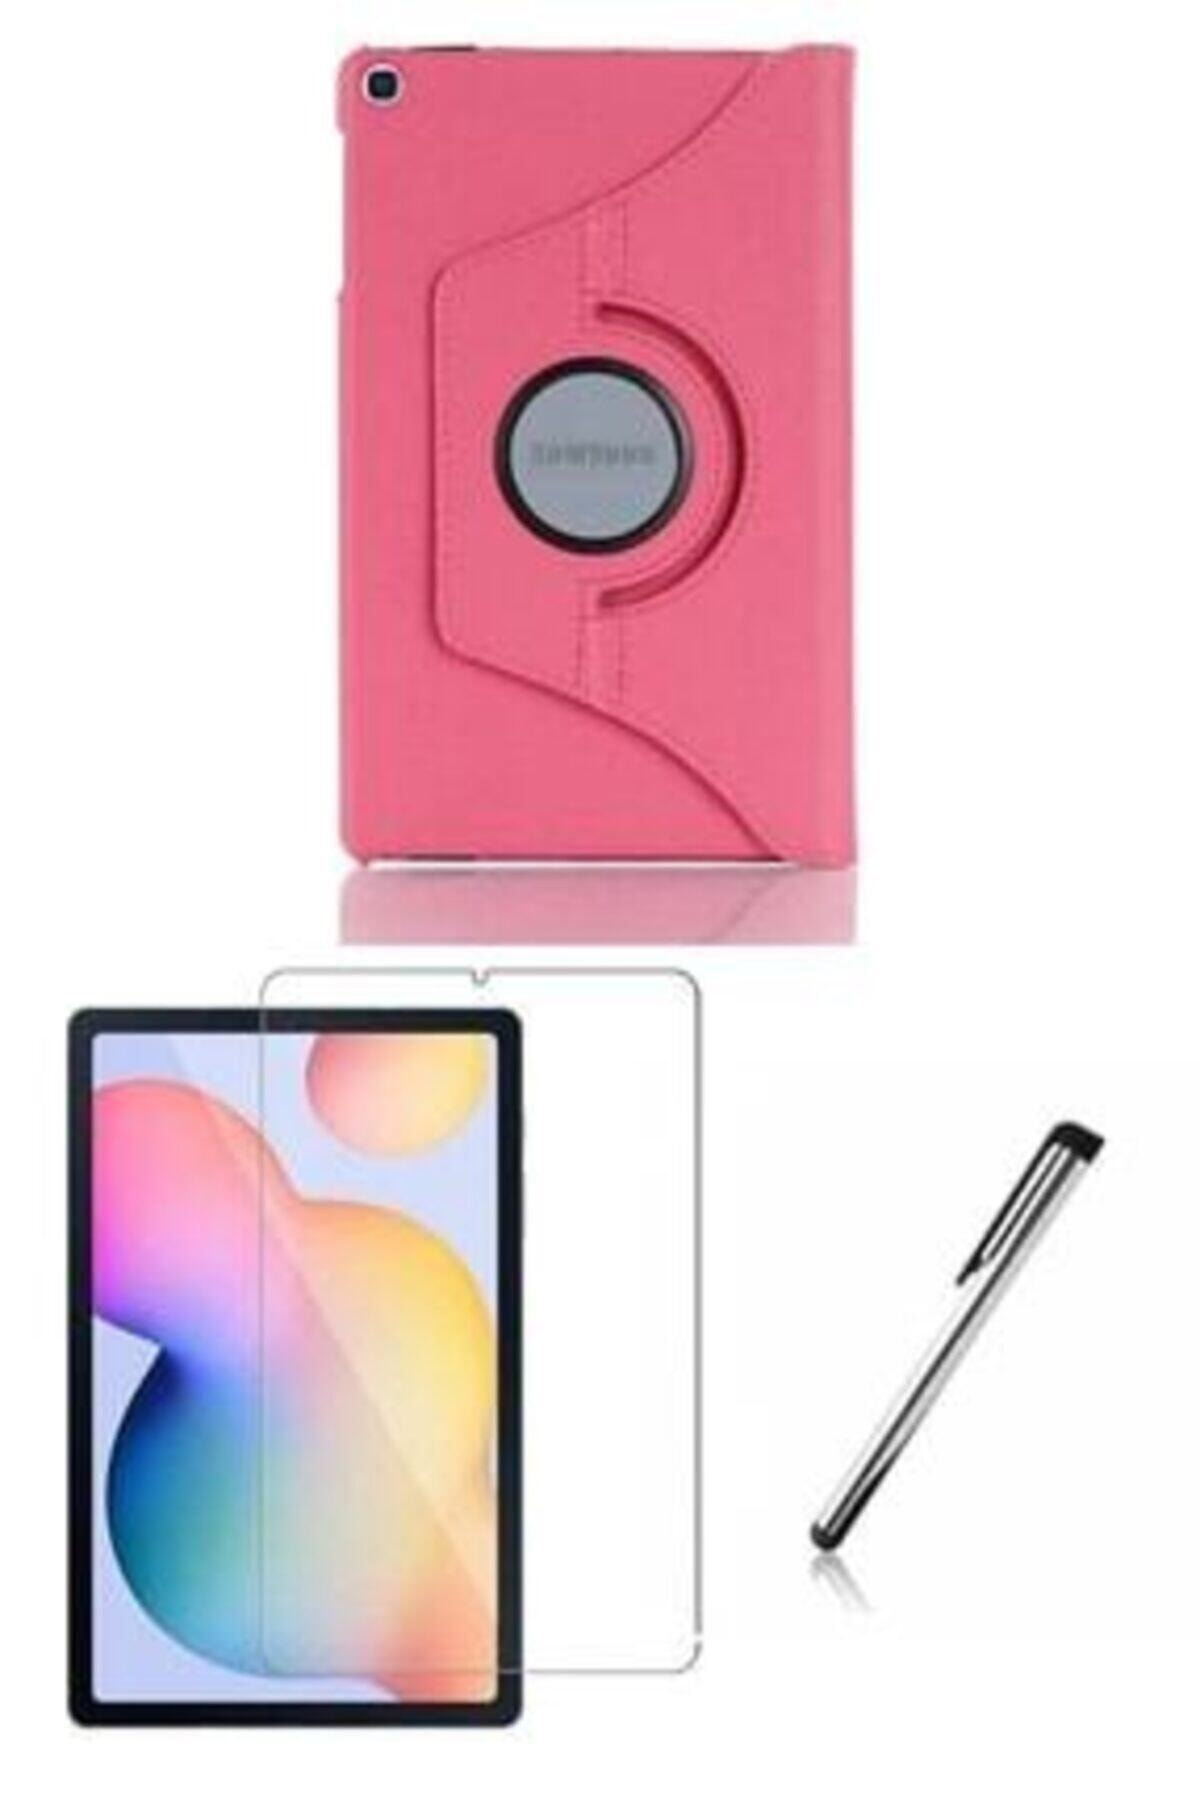 Galaxy Tab S6 Lite P610 / P615 / P617 Pembe Dönebilen Standlı Kılıf Set